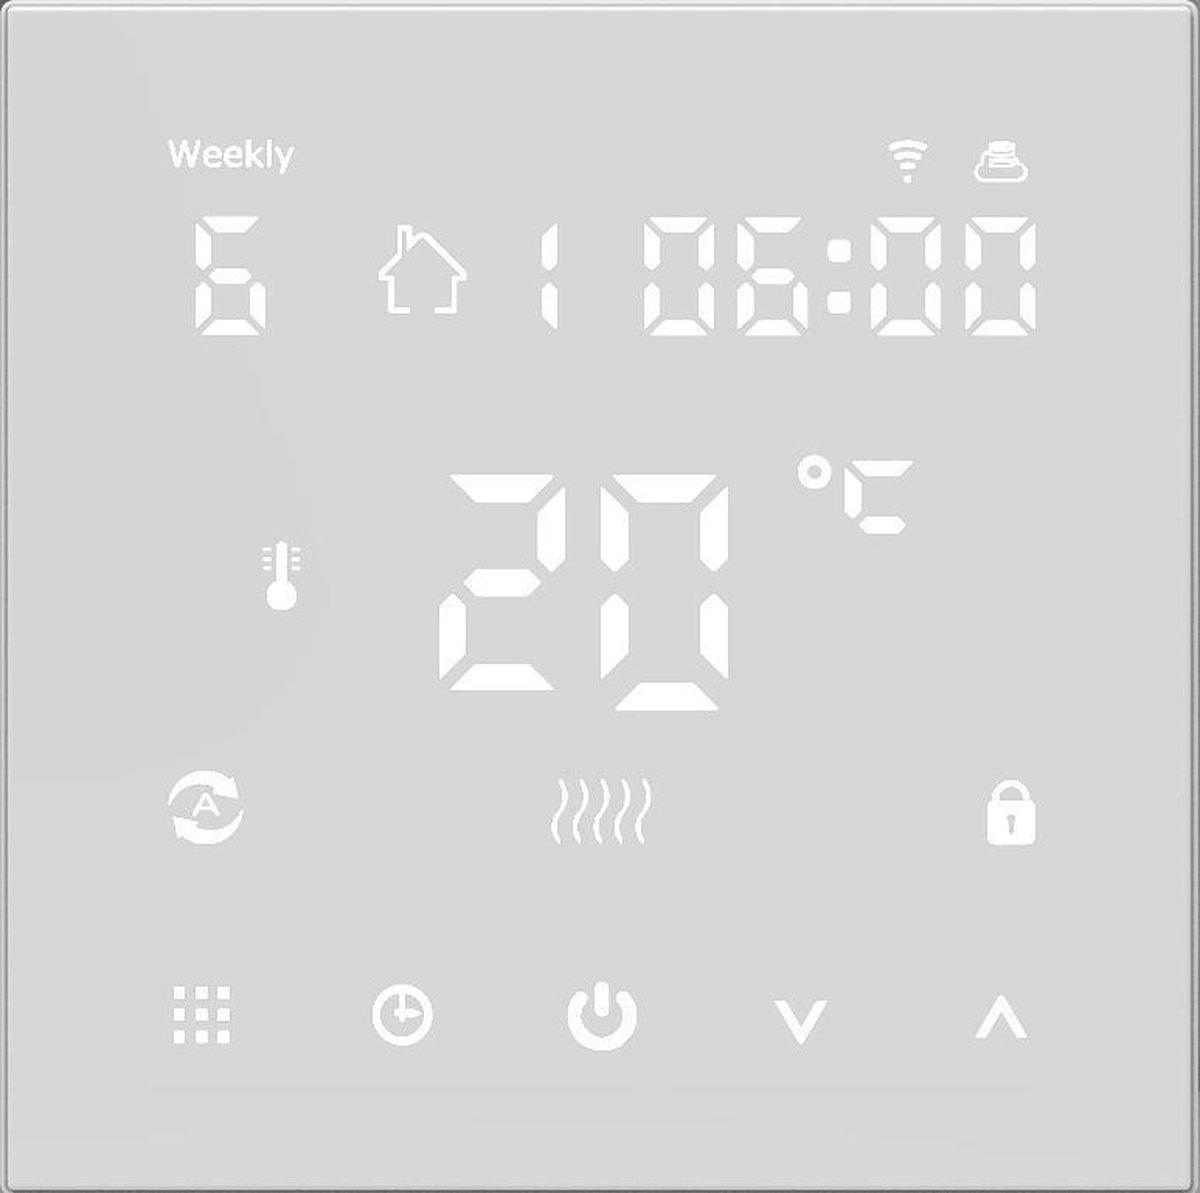 Wifi PRF-79 vloerverwarming en infrarood thermostaat Google Home & Amazon Alexa Compatible - Quality Heating